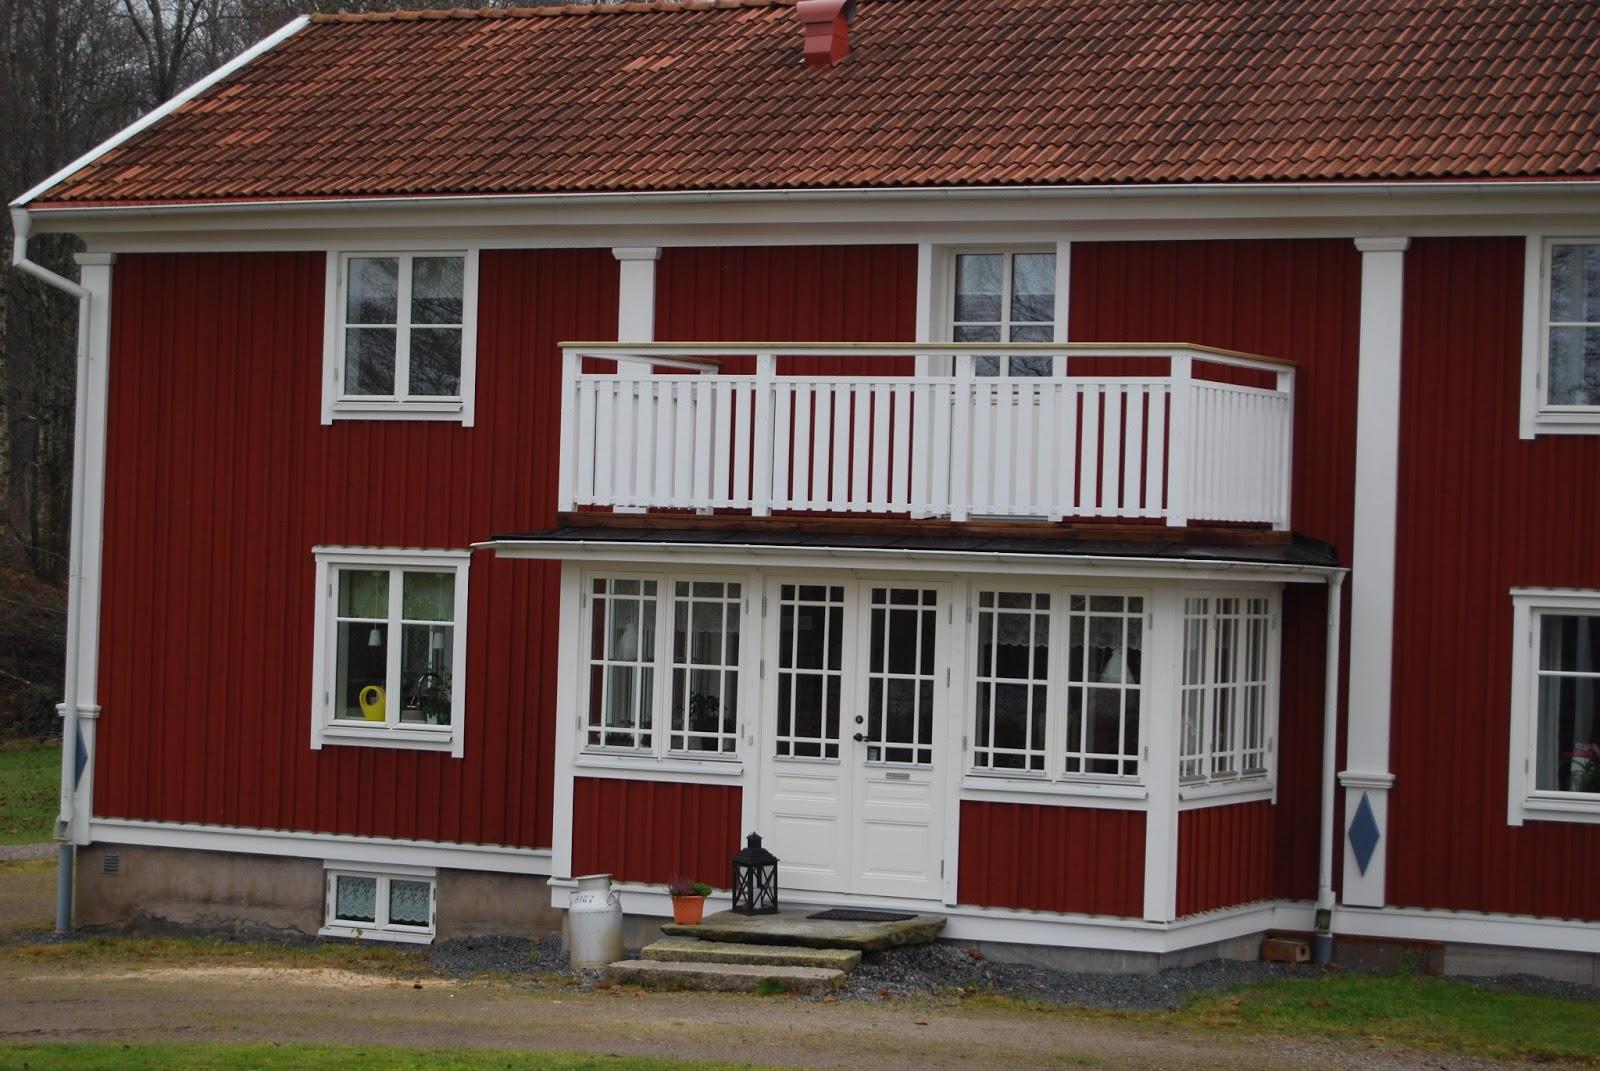 Uffes Bygg: Ny balkong! : balkongräcke trä : Inredning